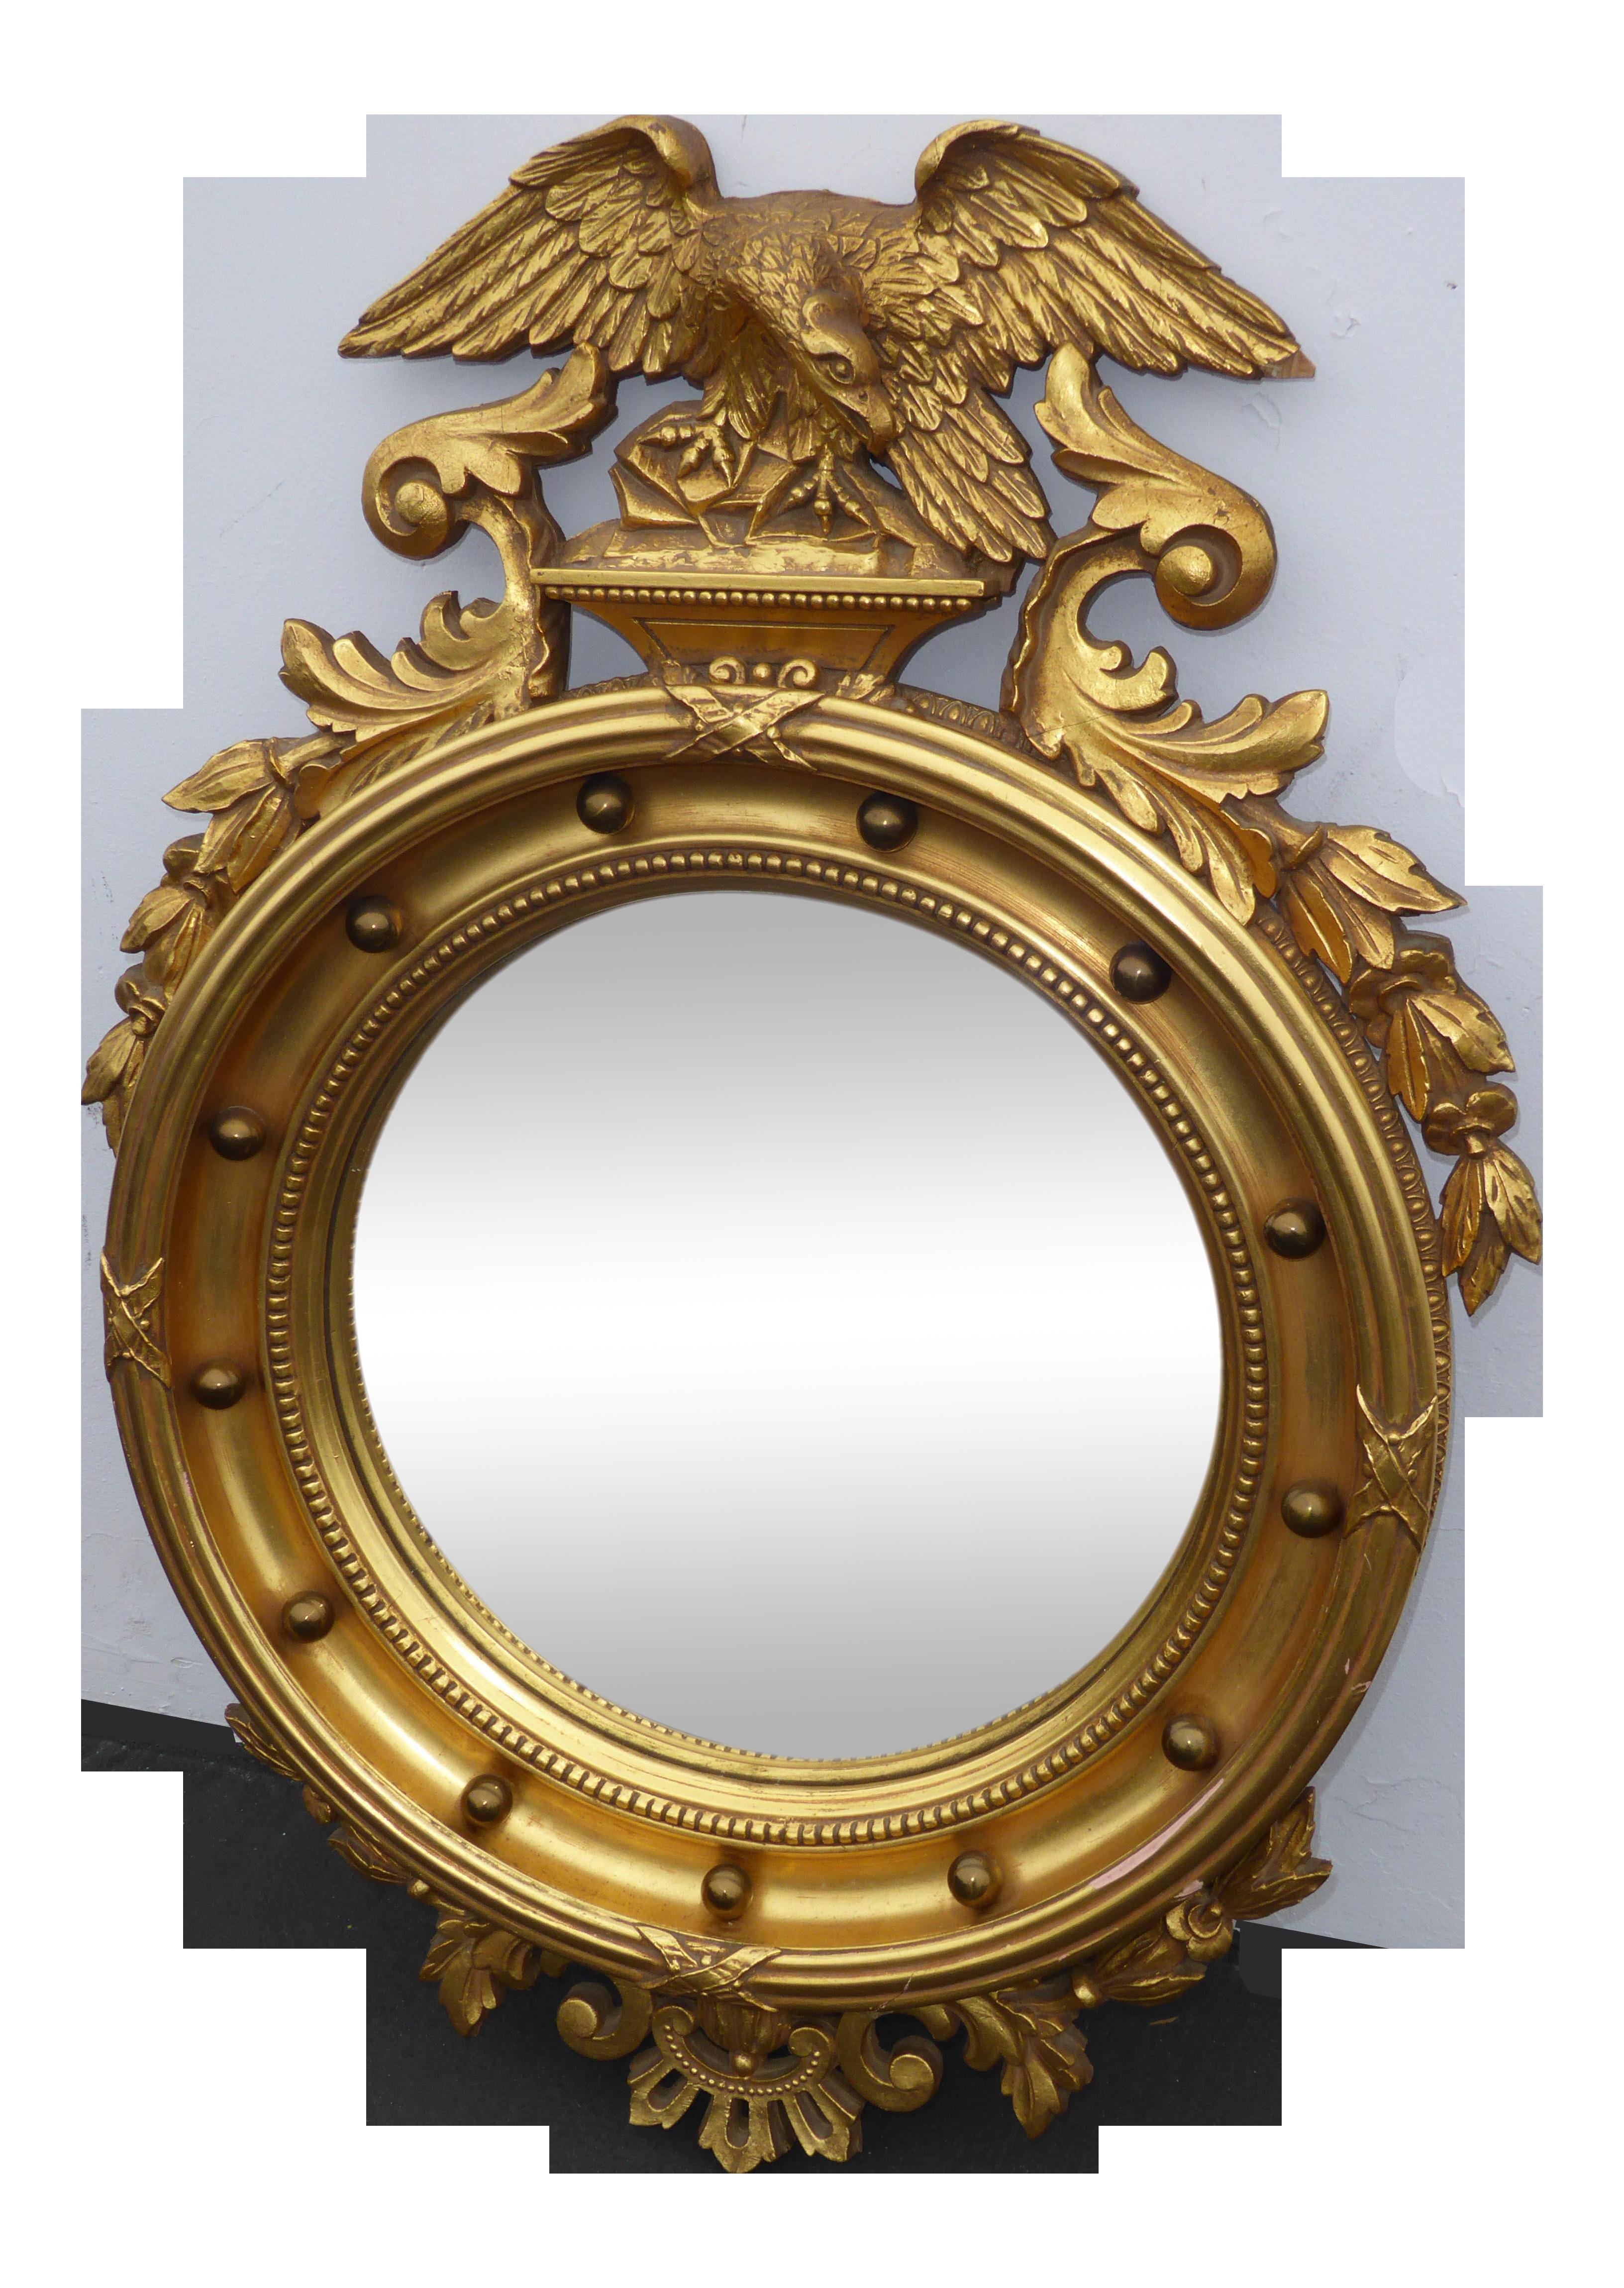 Antique federal solid wood bullseye eagle convex wall mirror 13 antique federal solid wood bullseye eagle convex wall mirror 13 colonies chairish amipublicfo Gallery